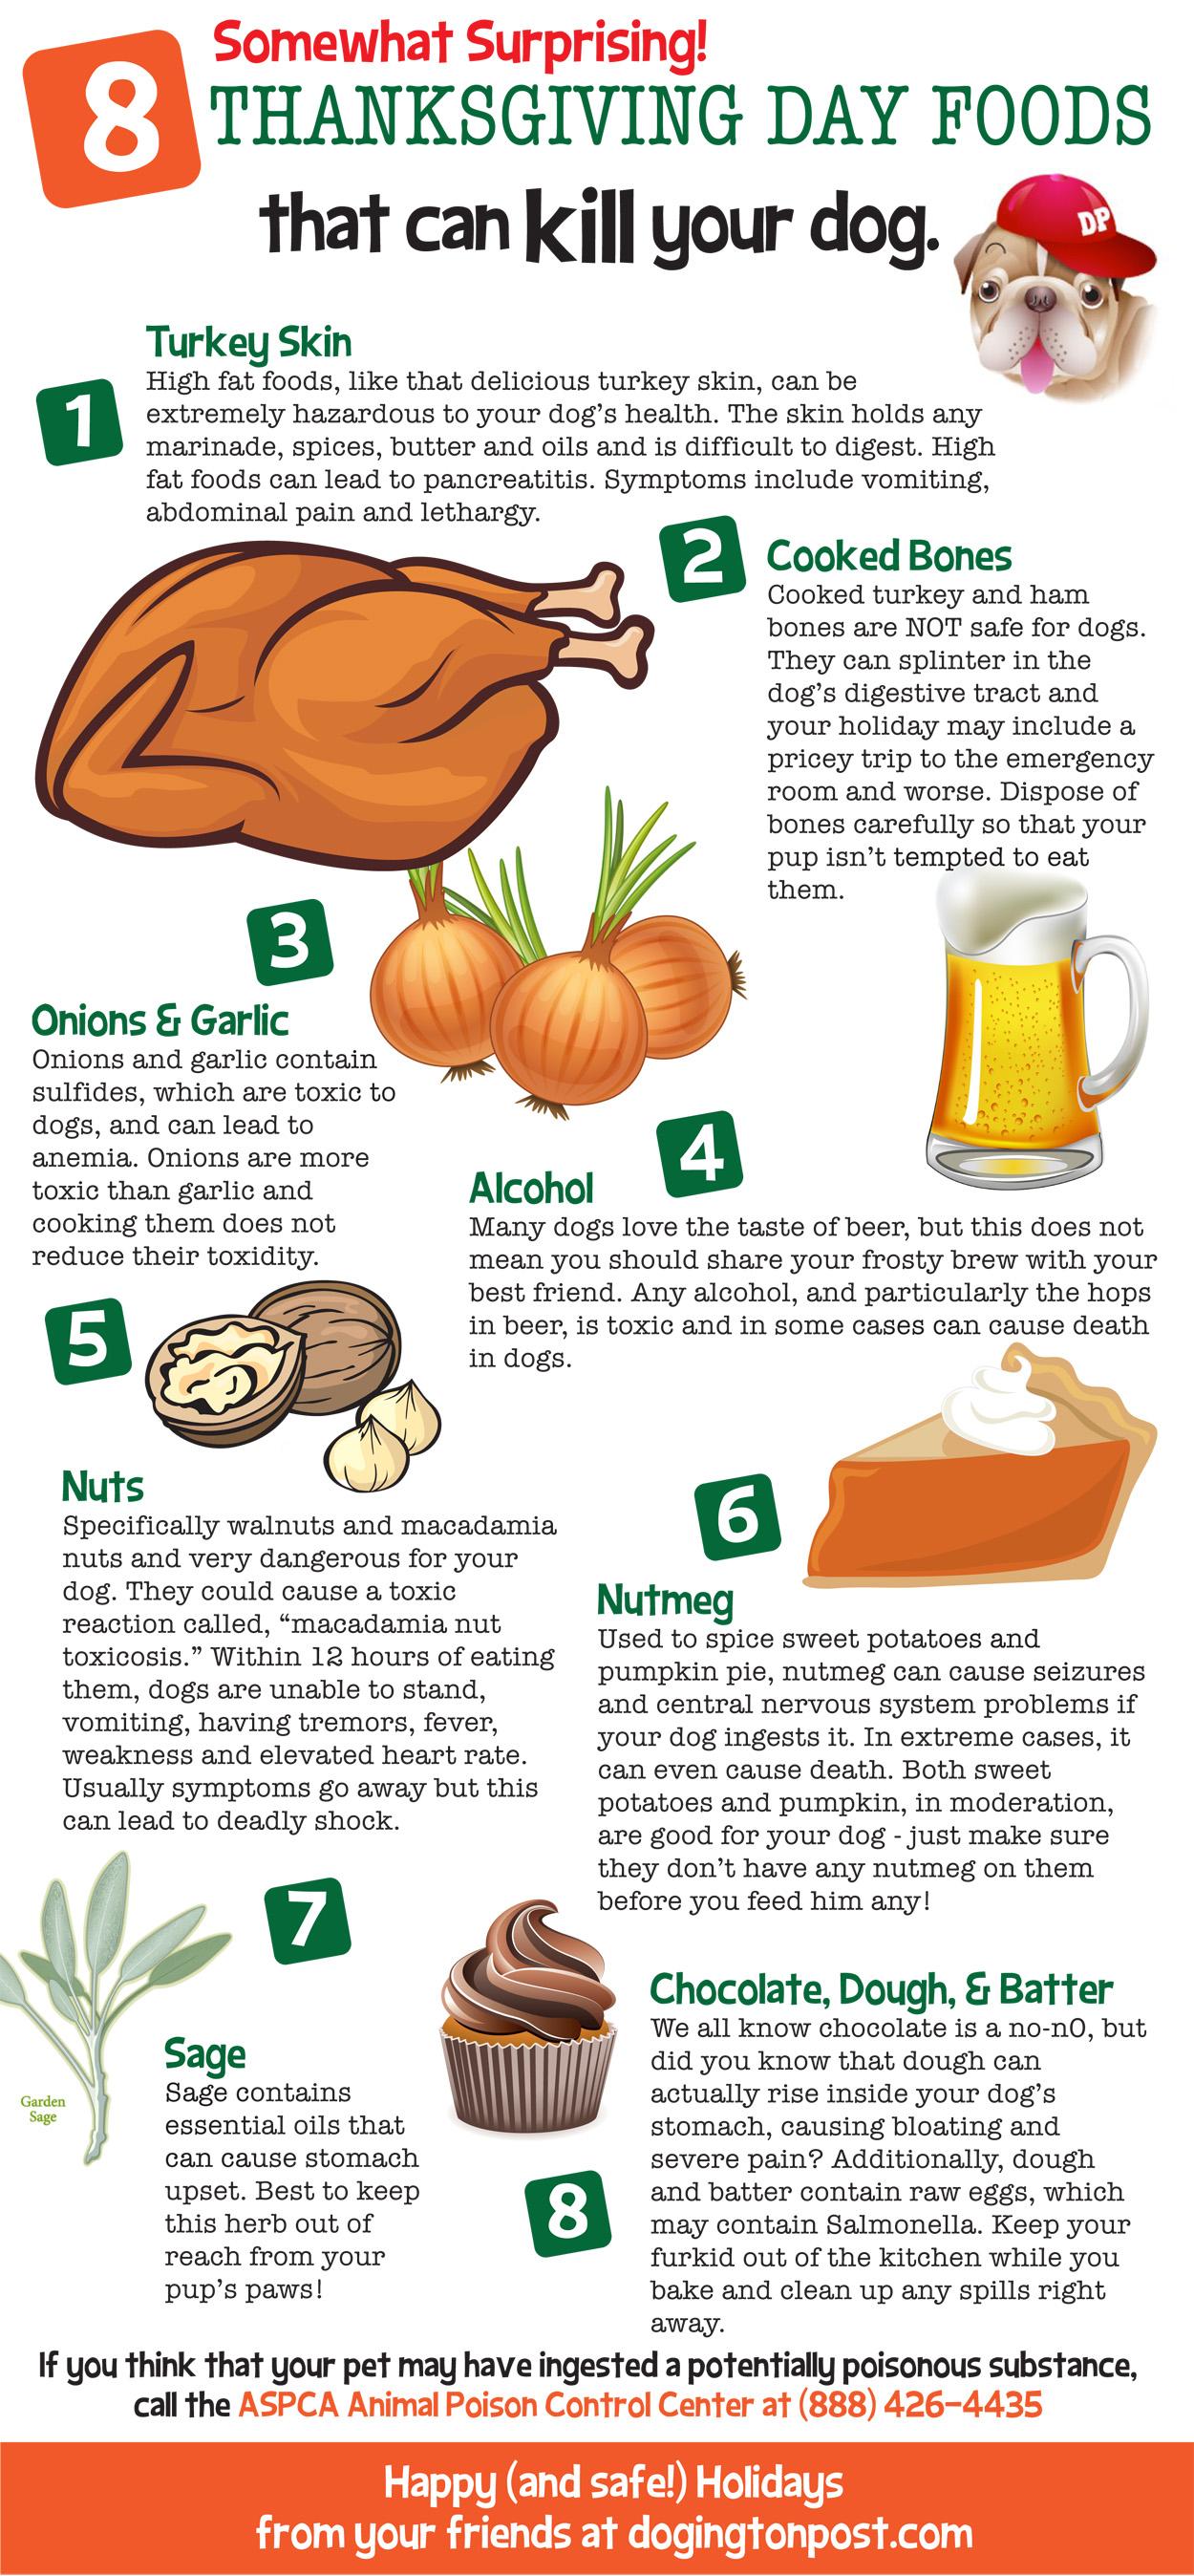 Thanksgiving food dangers